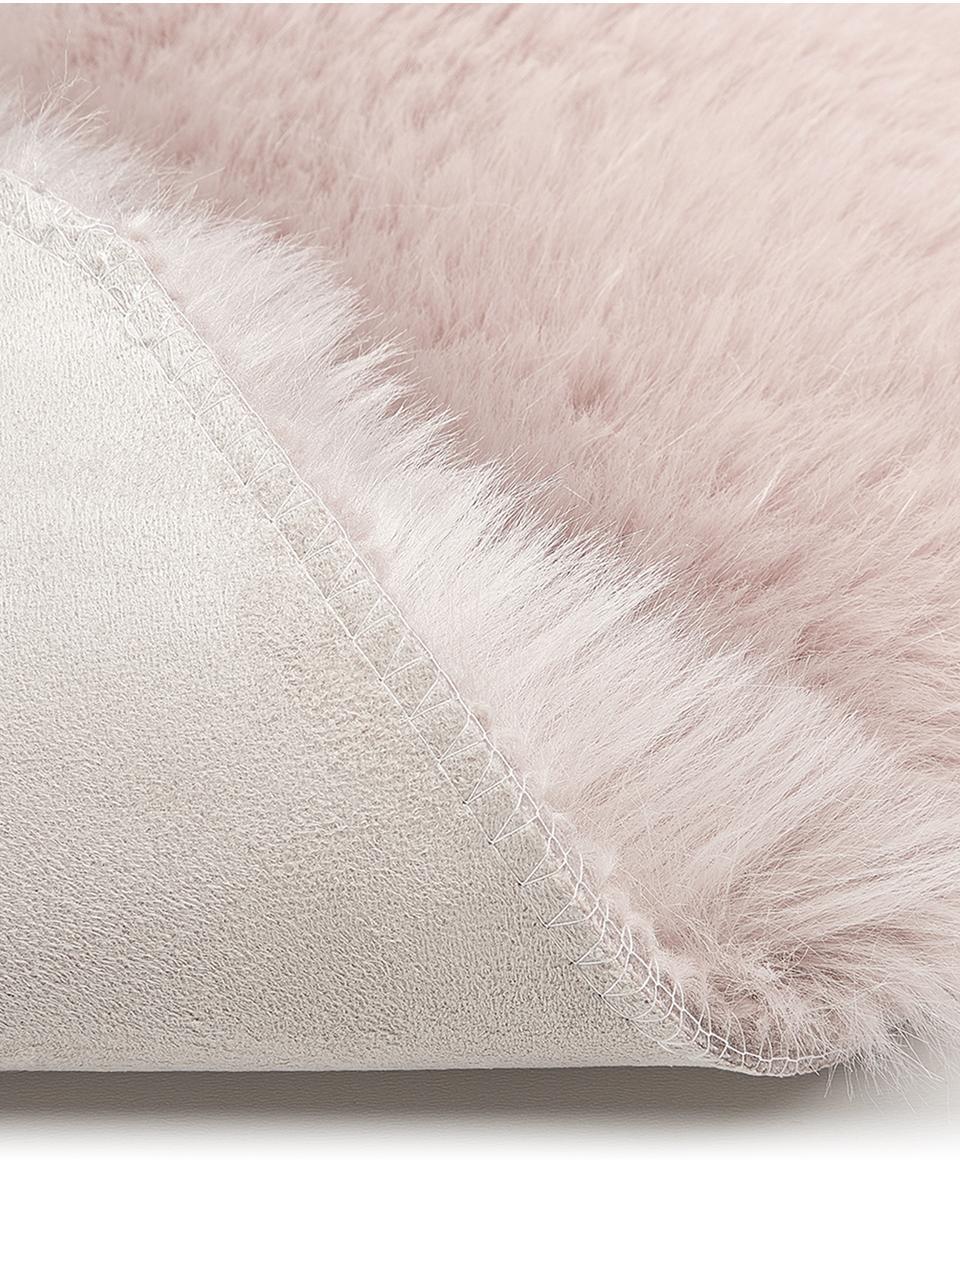 Kunstfell Mathilde, glatt, Vorderseite: 65% Acryl, 35% Polyester, Rückseite: 100% Polyester, Rosa, 60 x 90 cm